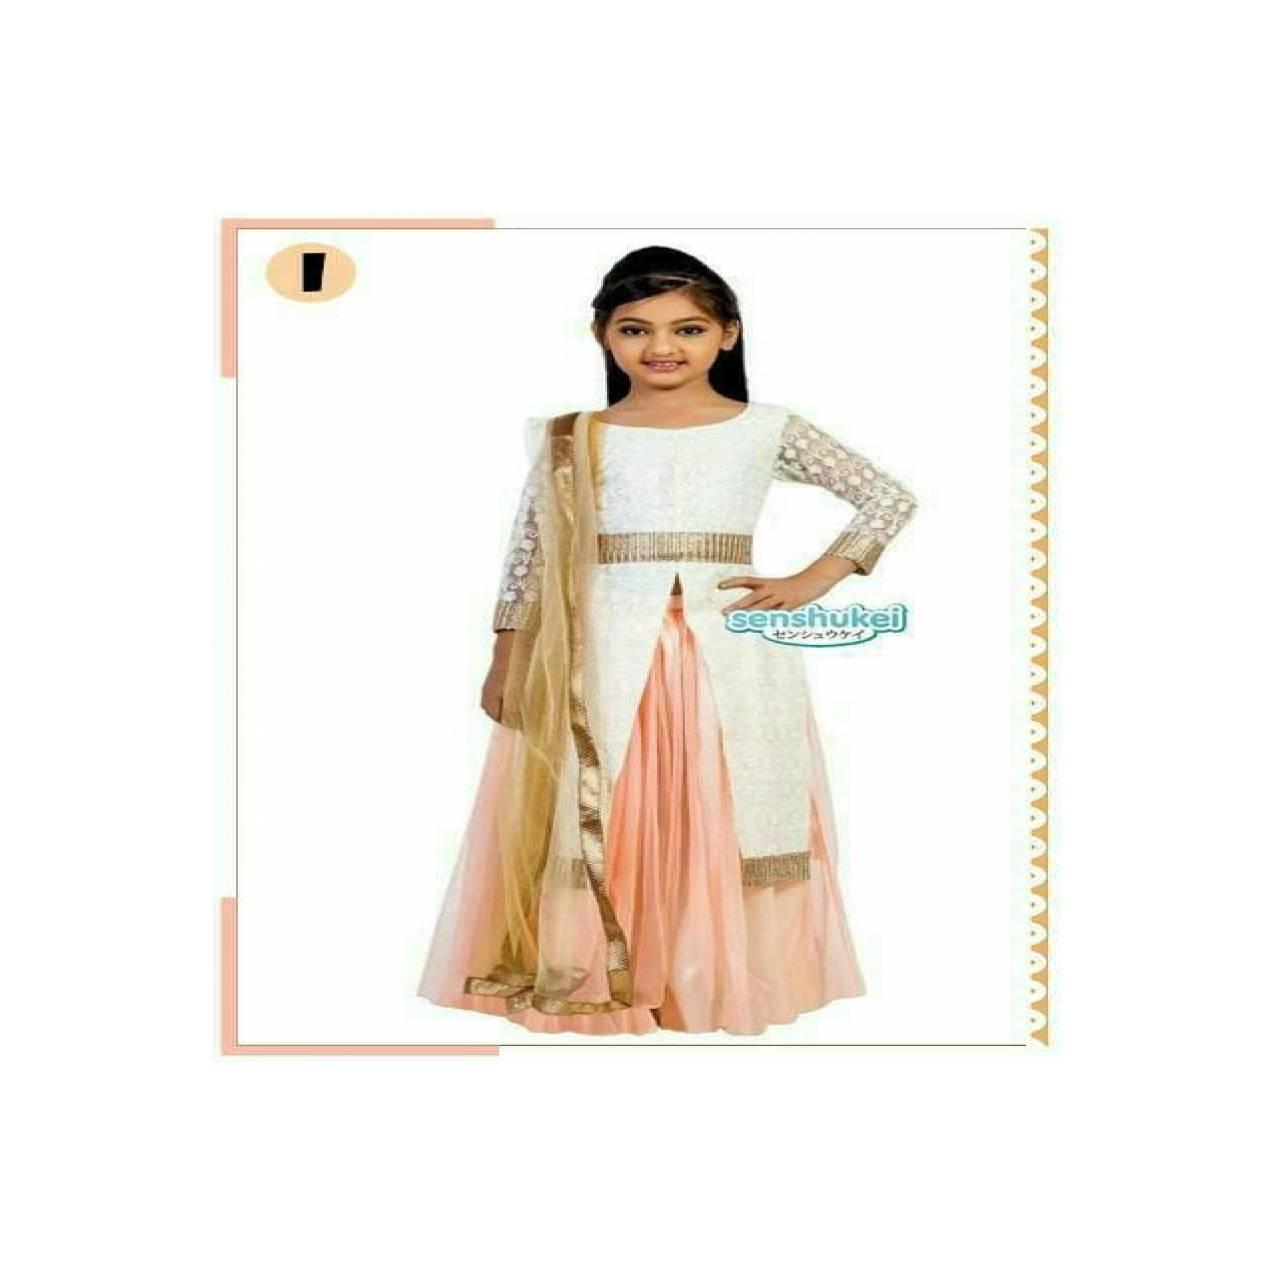 setelan baju gamis anak sari india merk shensukei 17 i